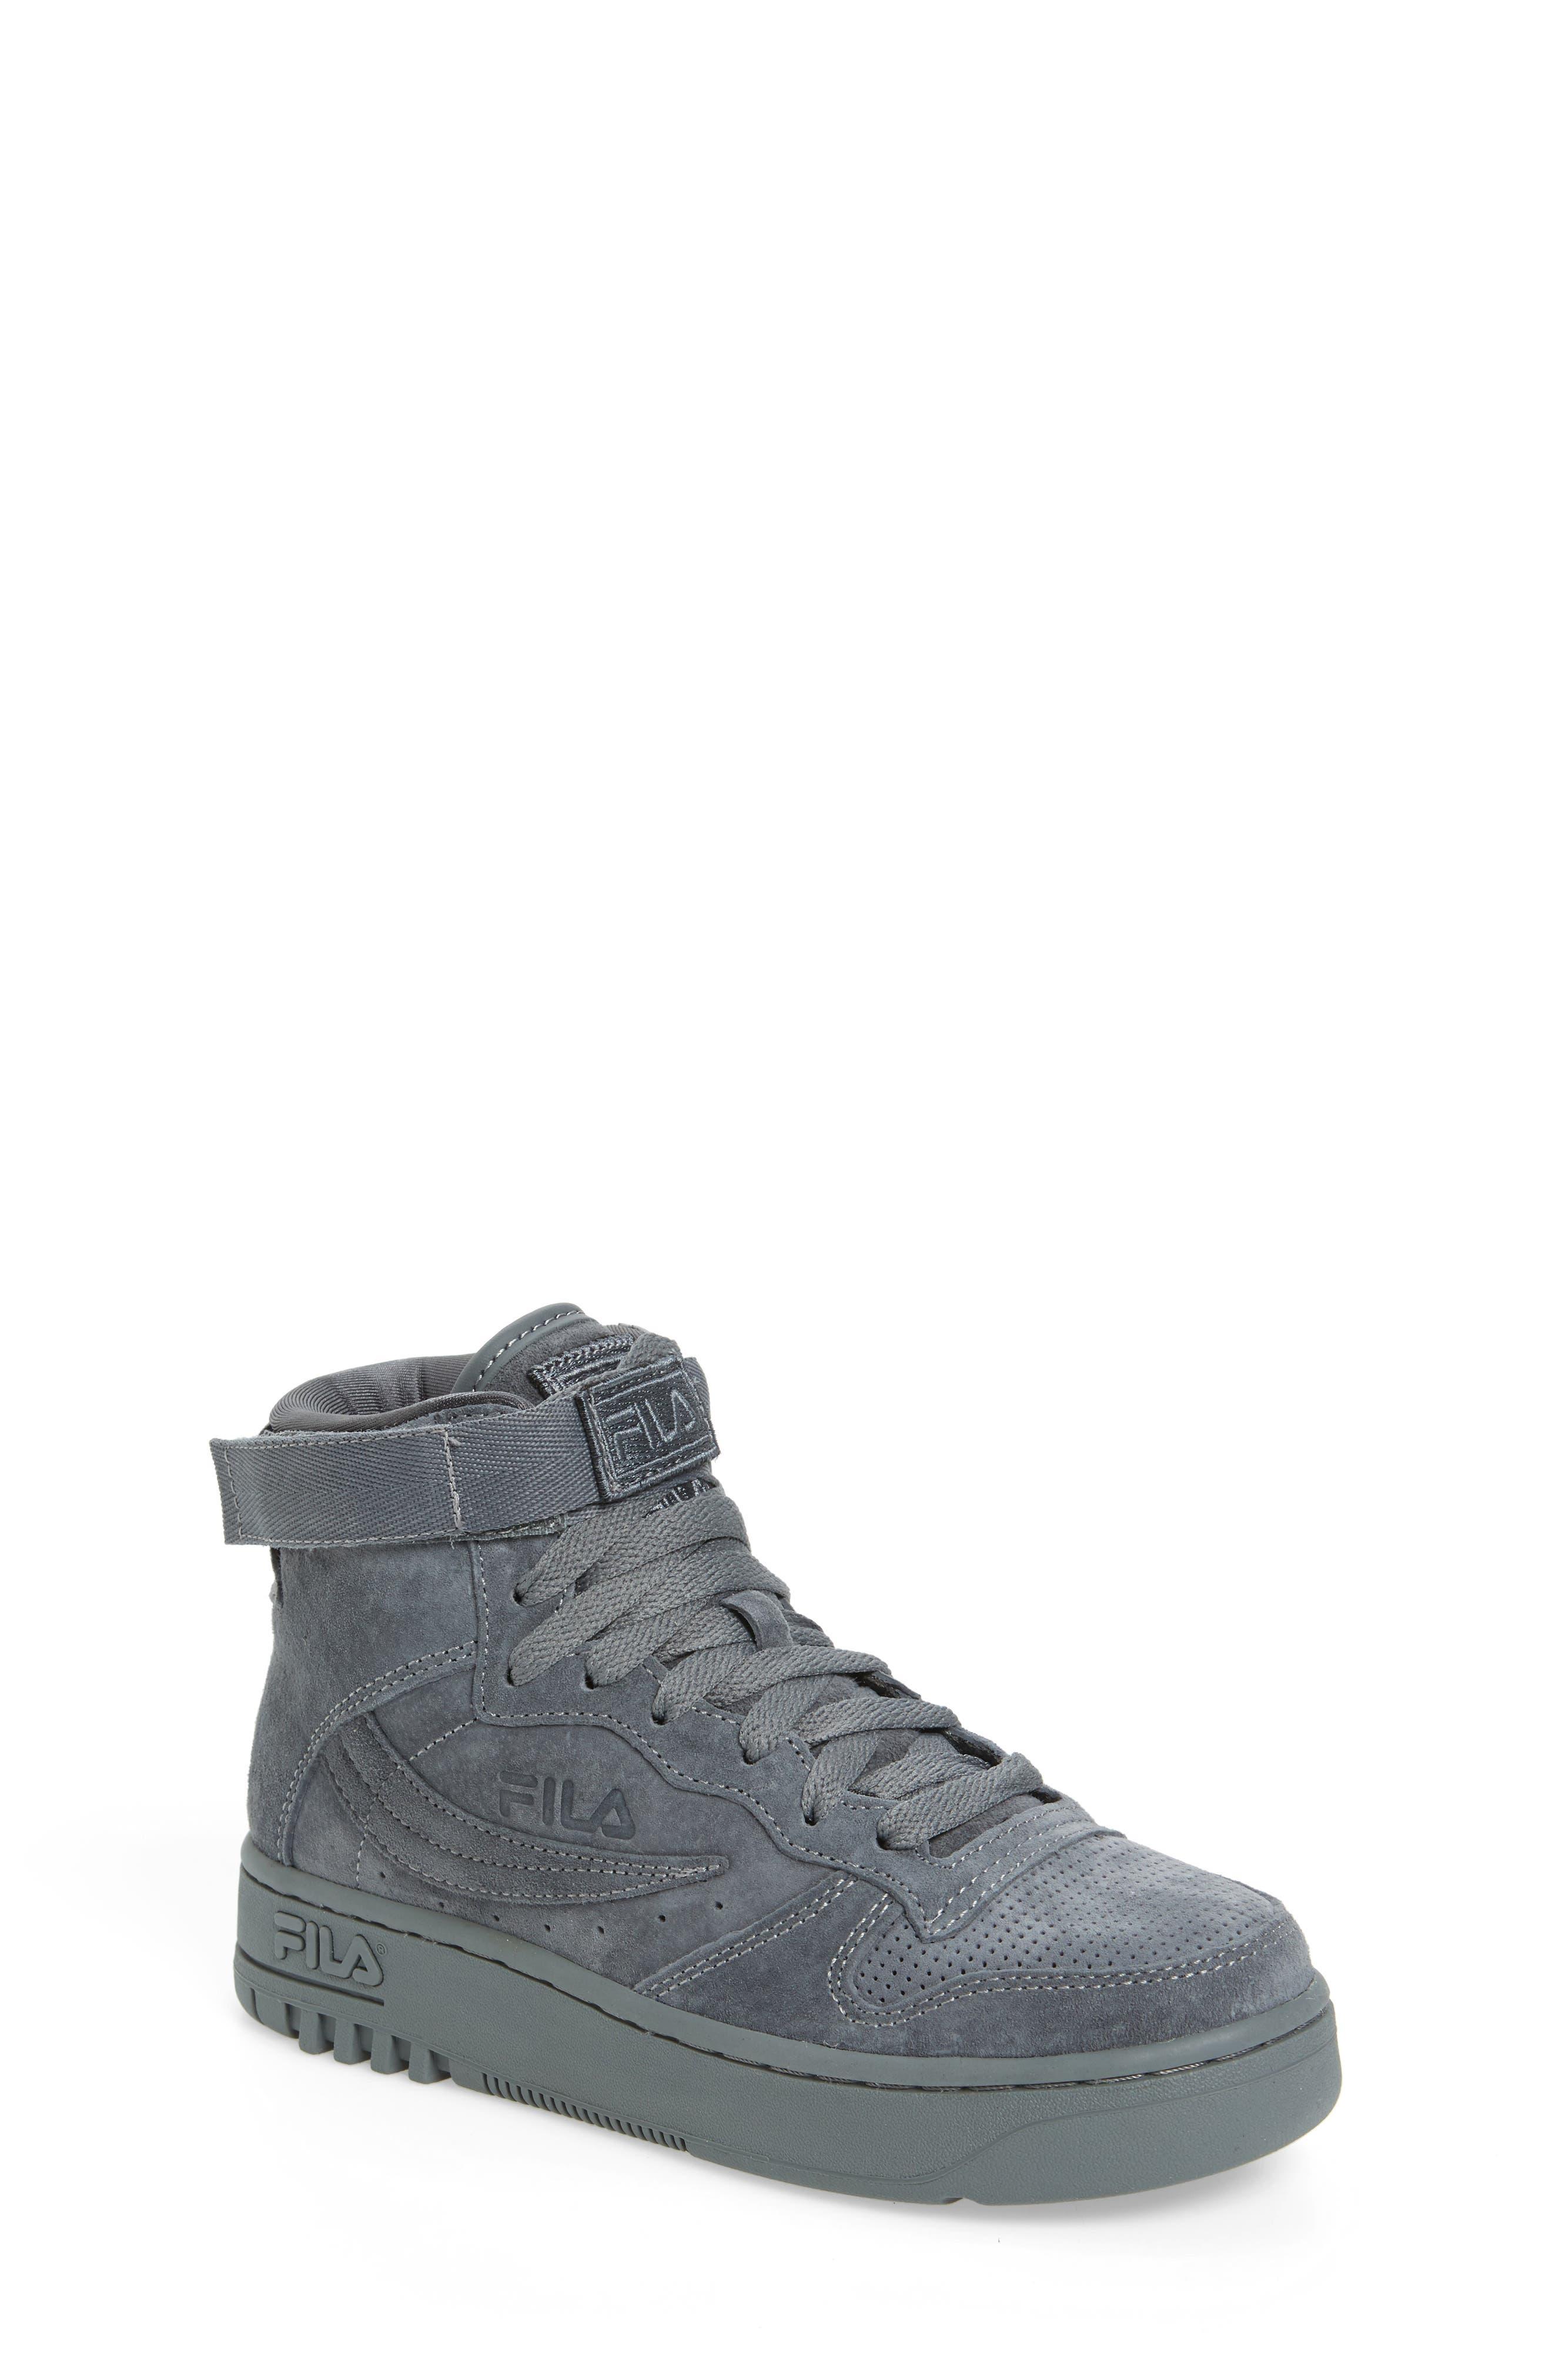 Alternate Image 1 Selected - Fila USA FX-100 High Top Sneaker (Big Kid)